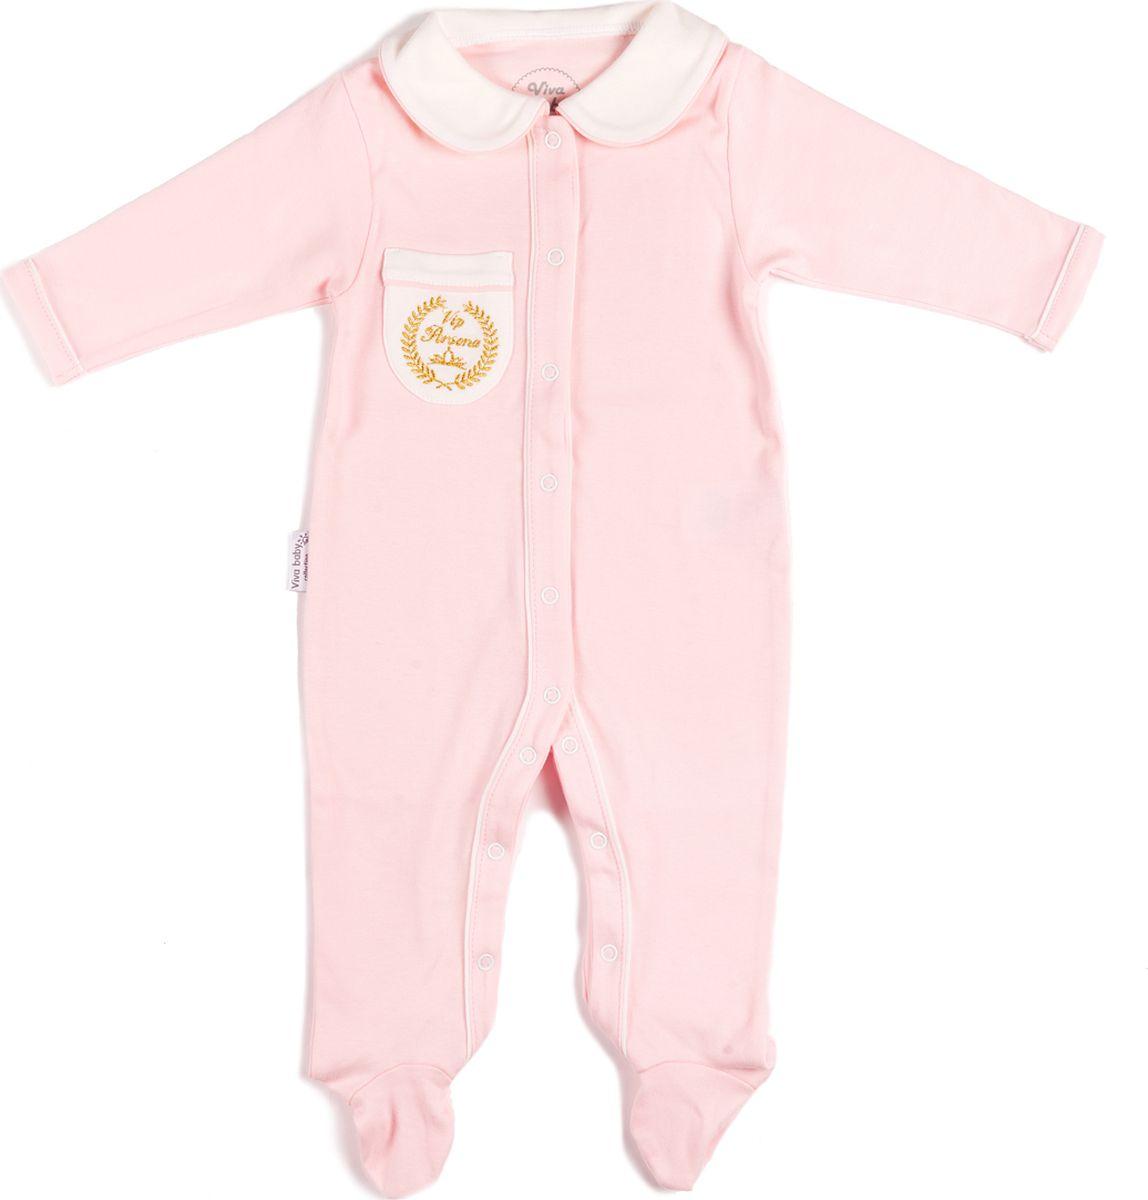 Комбинезон домашний Viva Baby комбинезон домашний для новорожденных viva baby цвет розовый d3103 2 размер 74